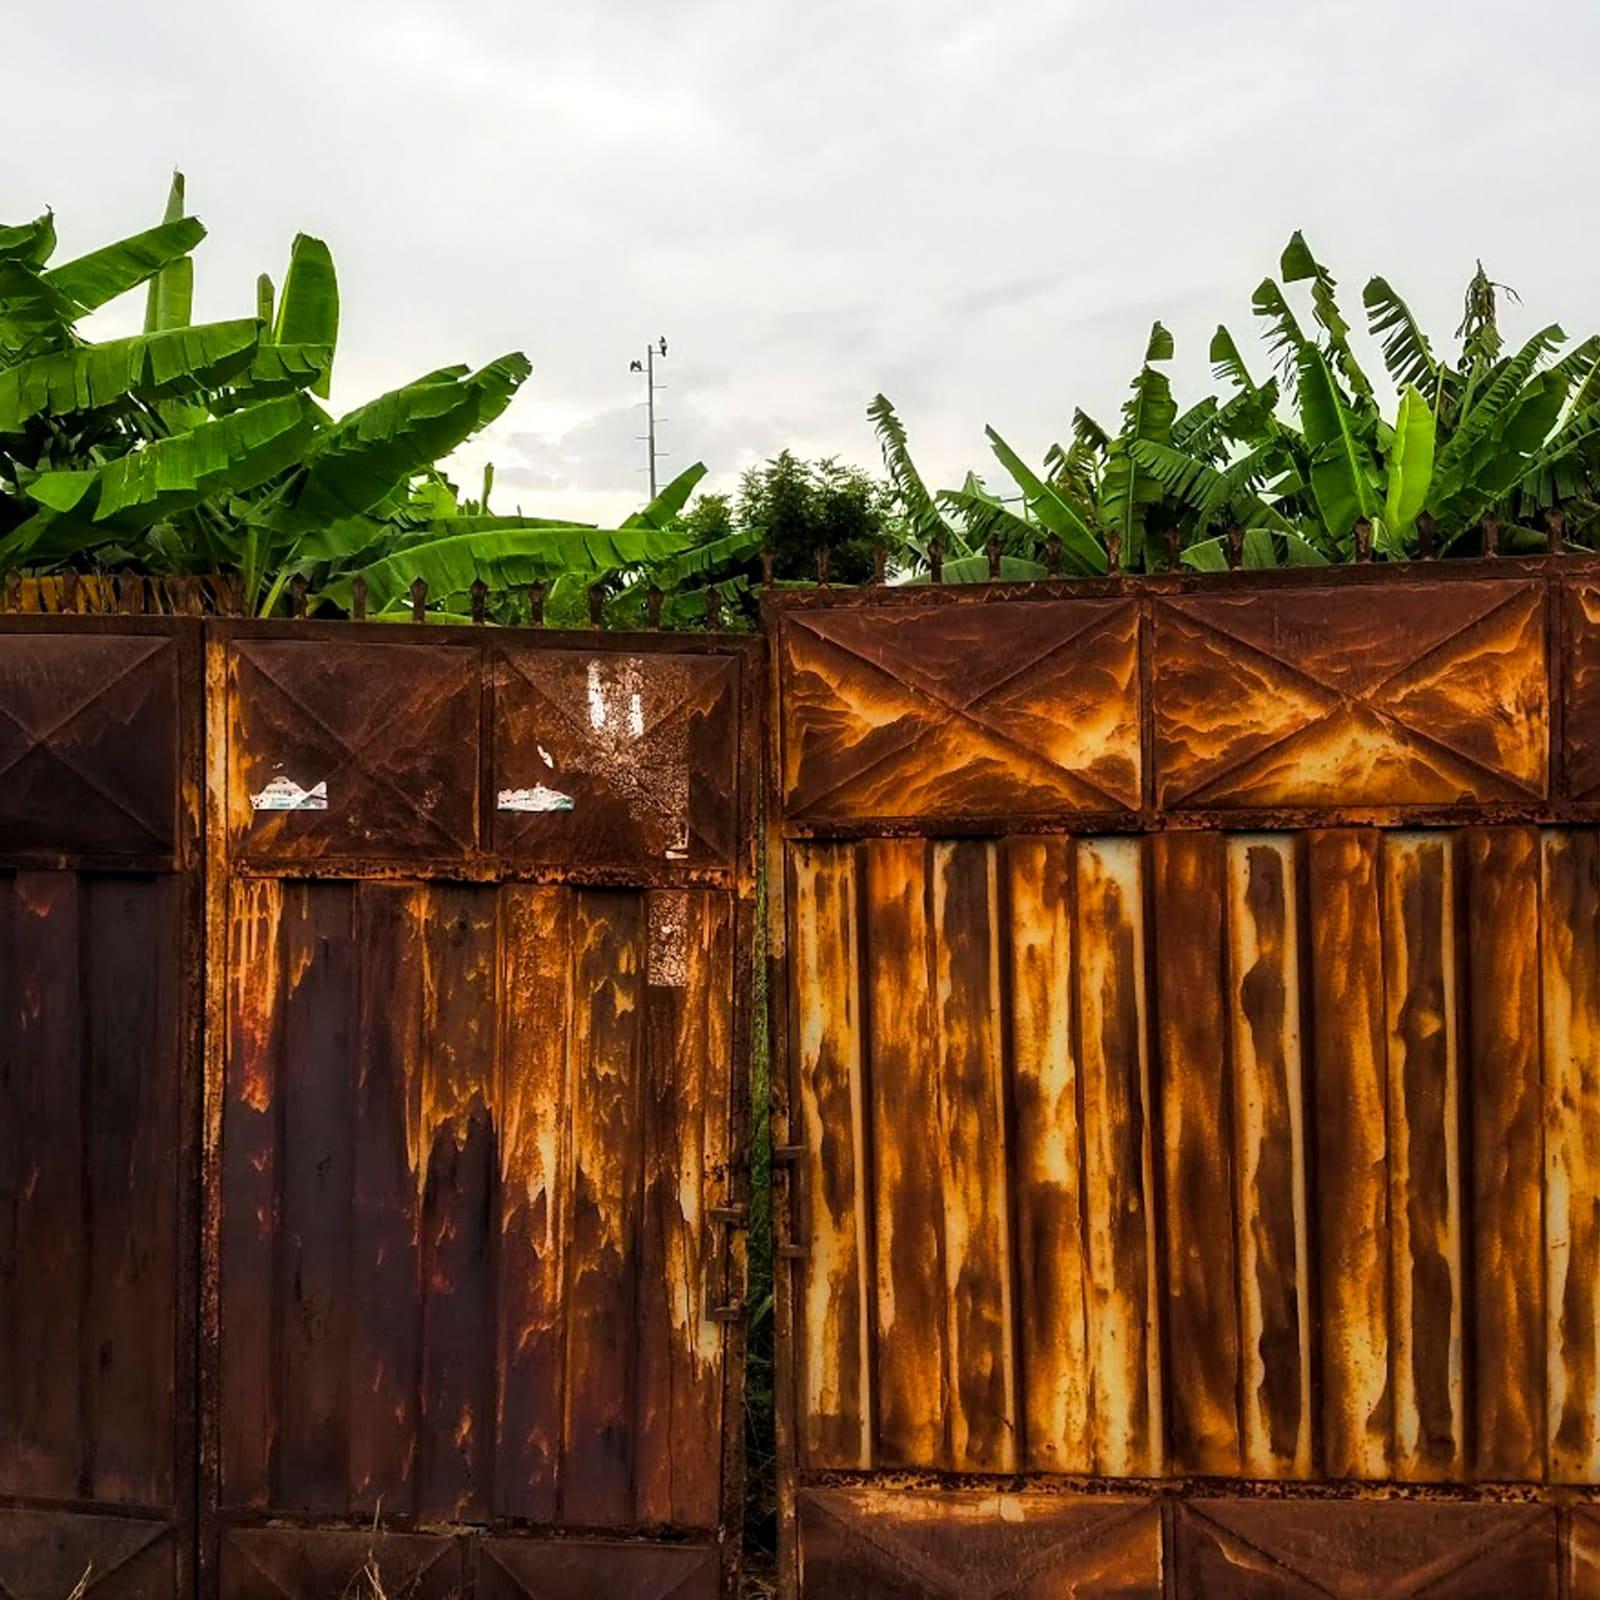 Hamzah Moshood Welcome to verdancy 42 x 42 cm 29.7 x 29.7 cm Digital print